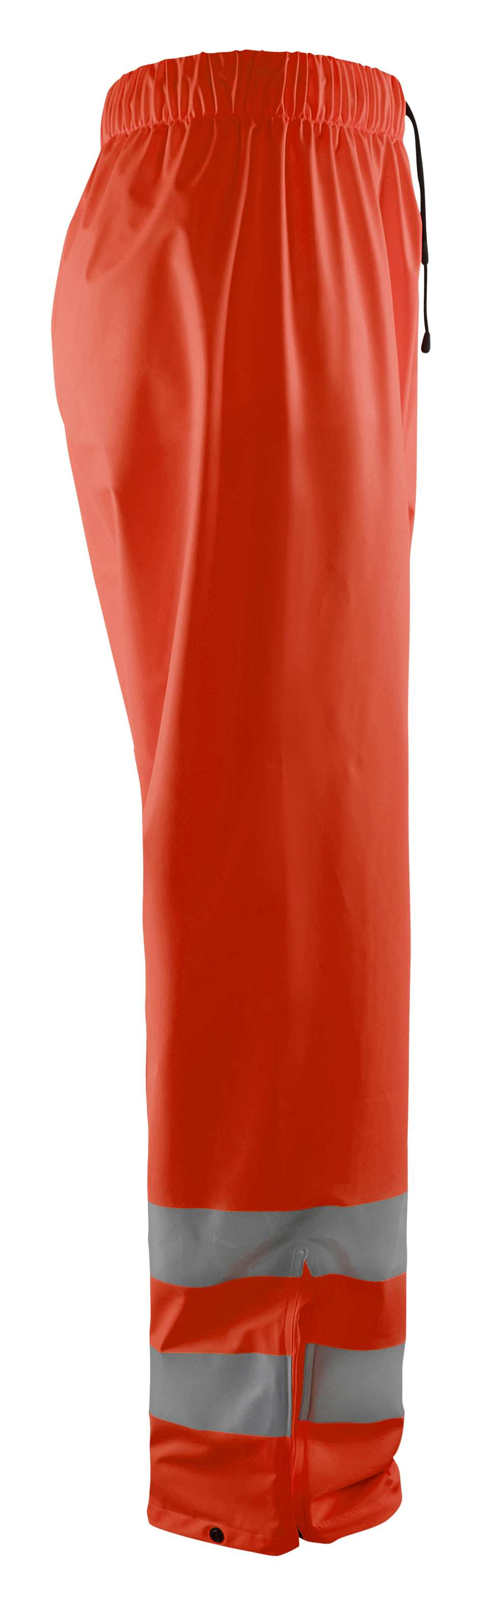 Blaklader Broeken 13842000 High Vis fluo-rood(5500)